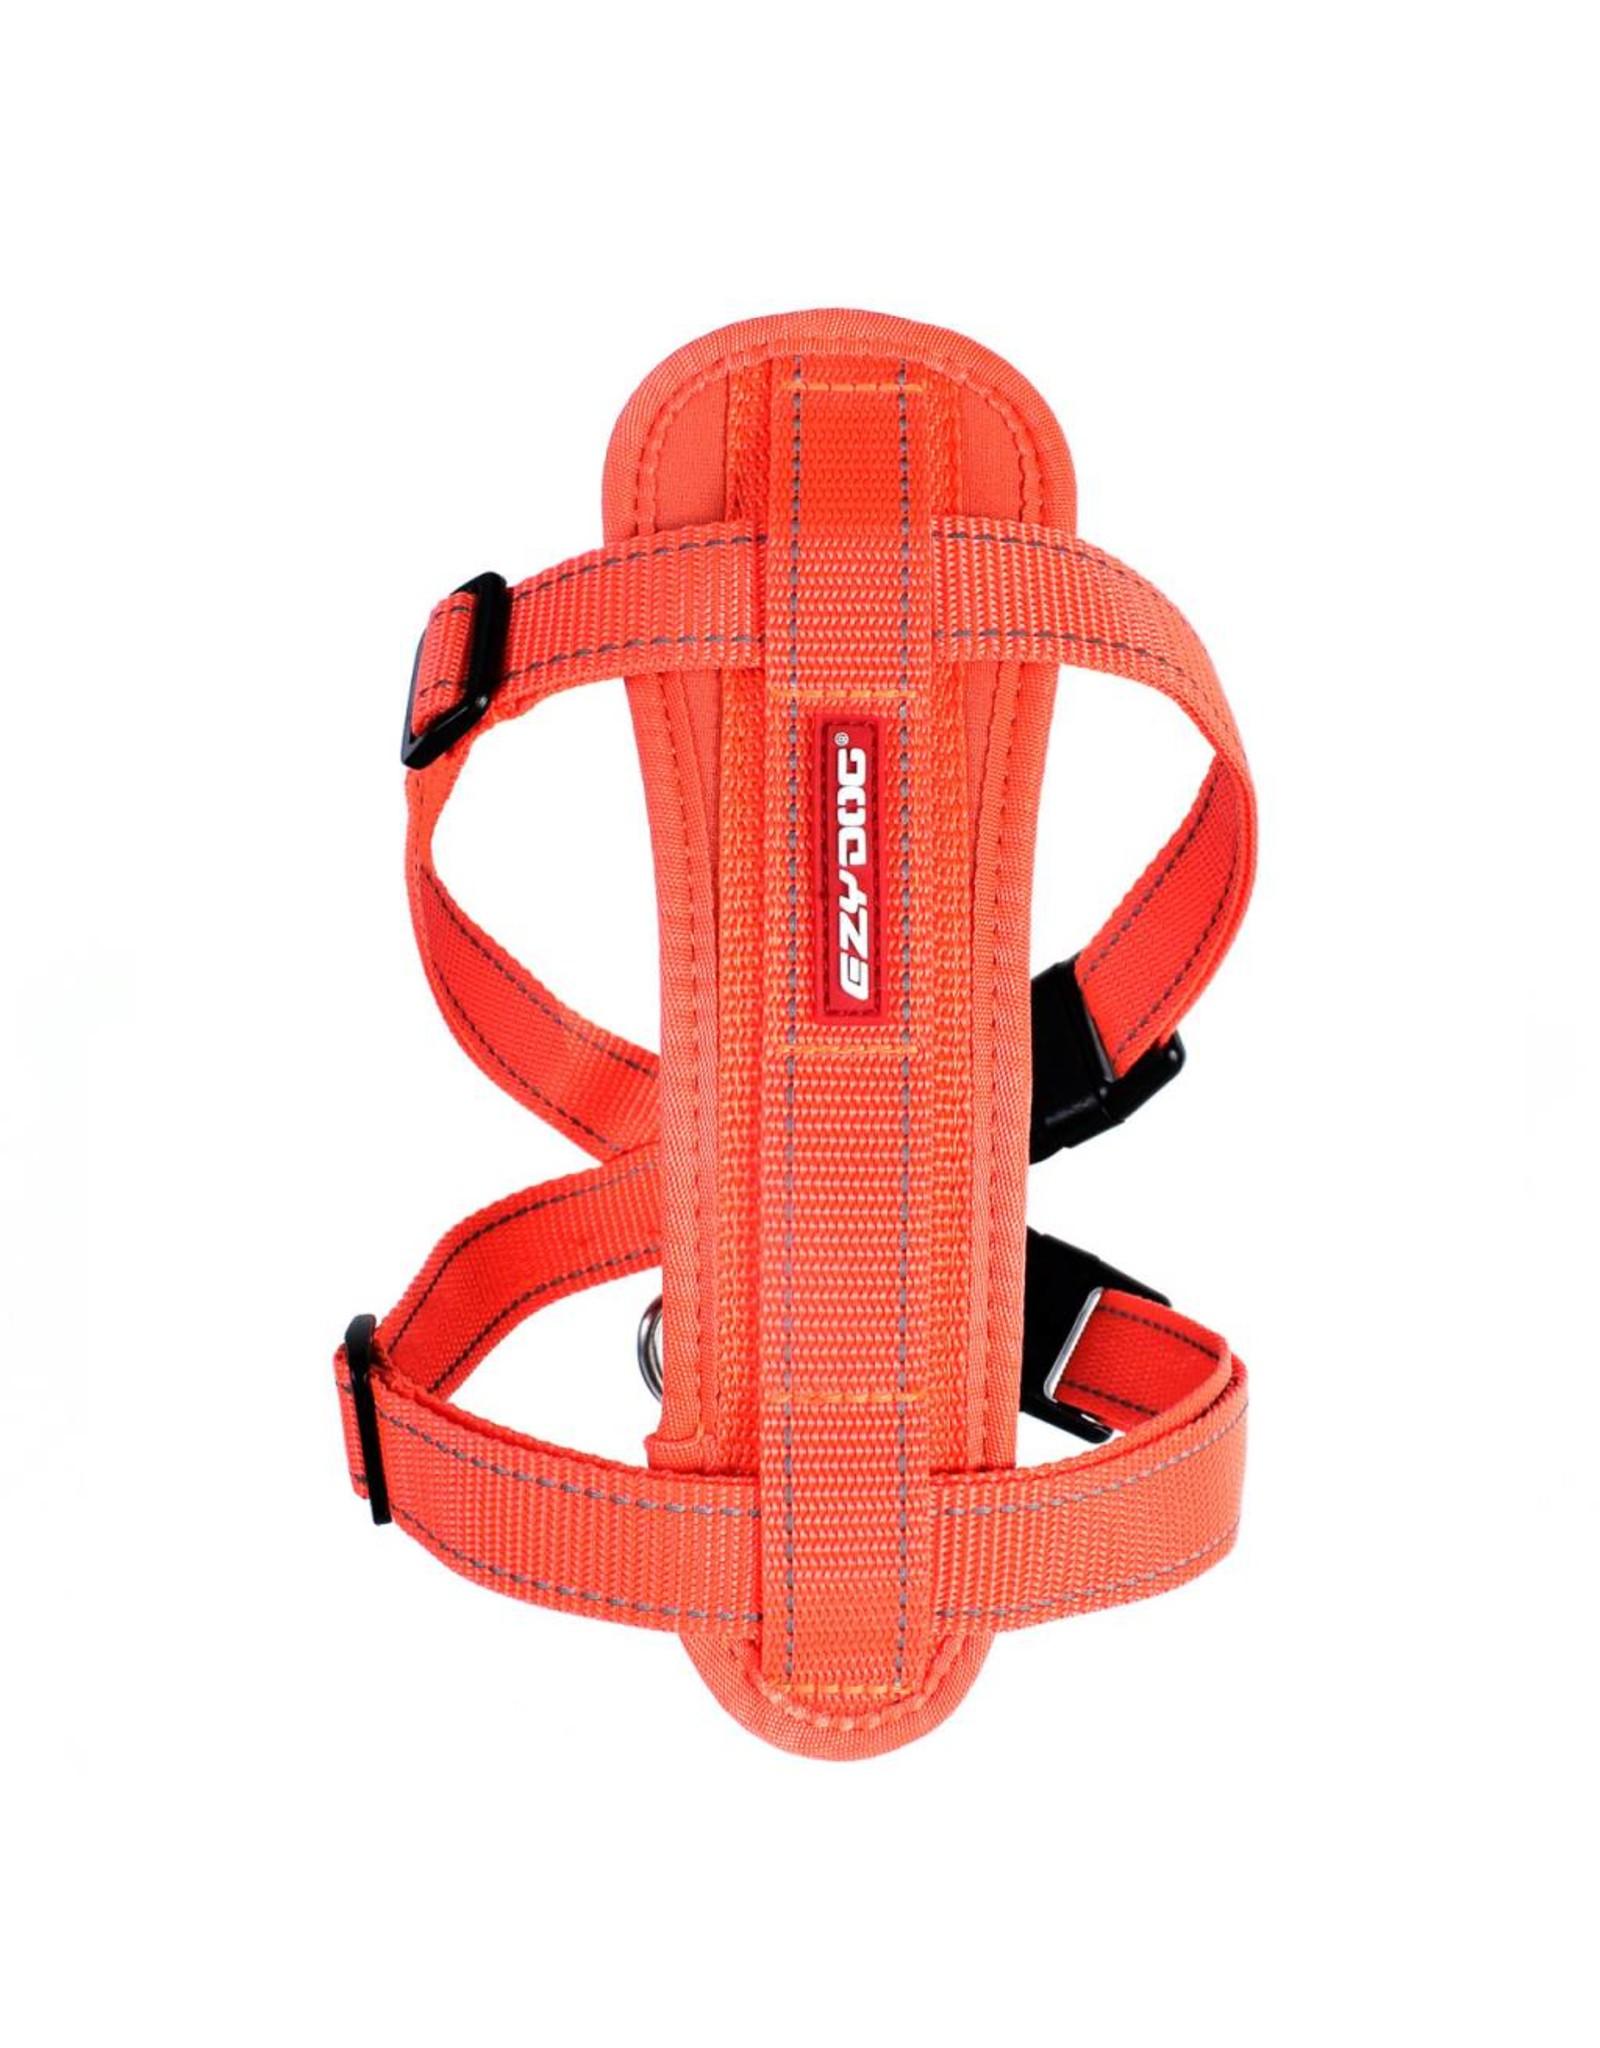 EzyDog Chest Plate Dog Harness with Seat Belt Loop, Burnt Orange